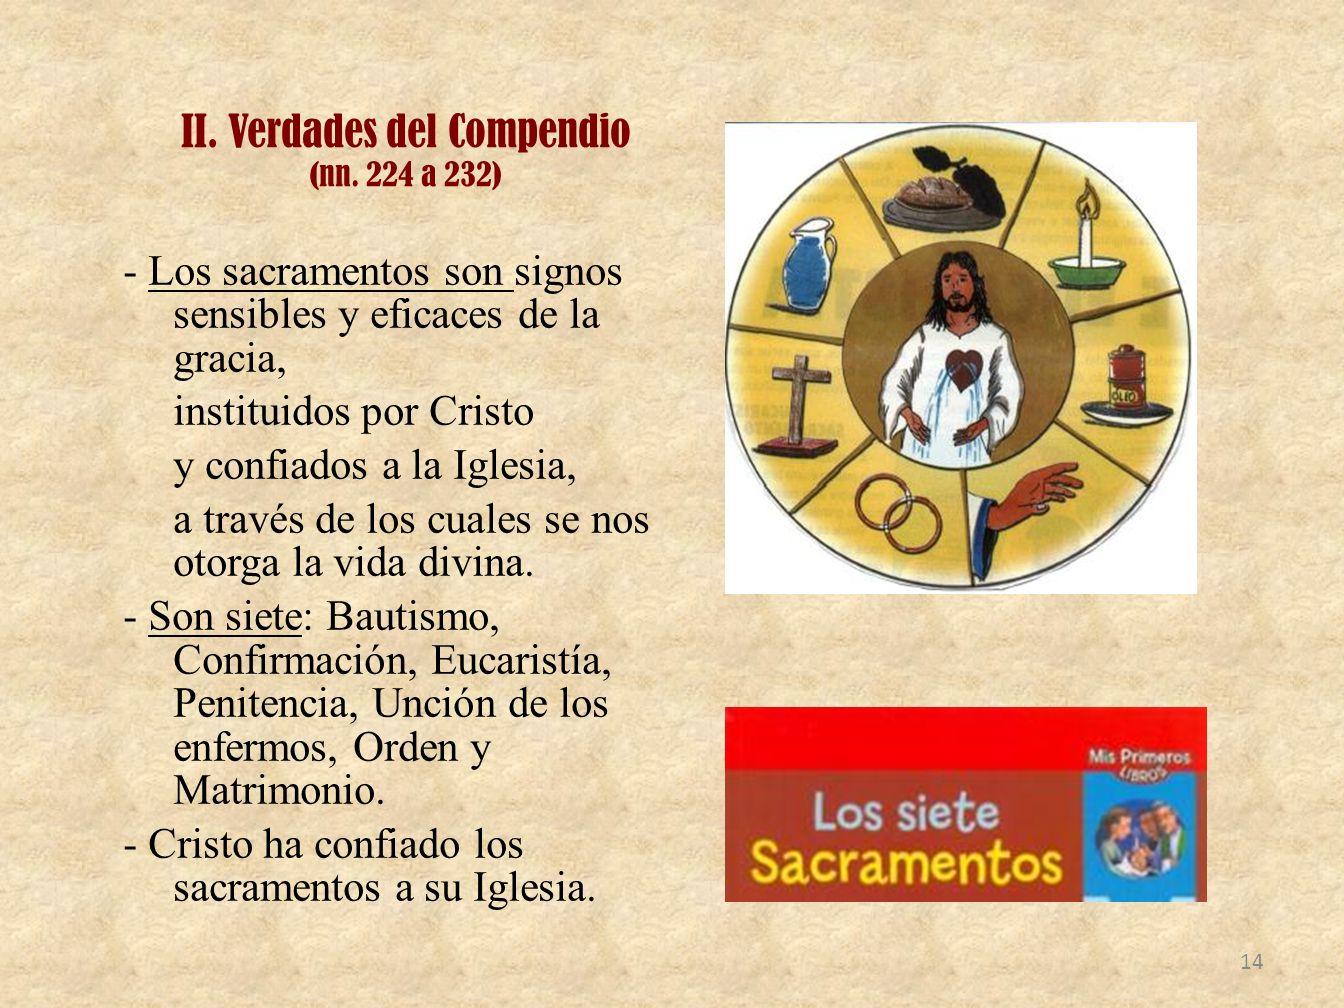 II. Verdades del Compendio (nn. 224 a 232)